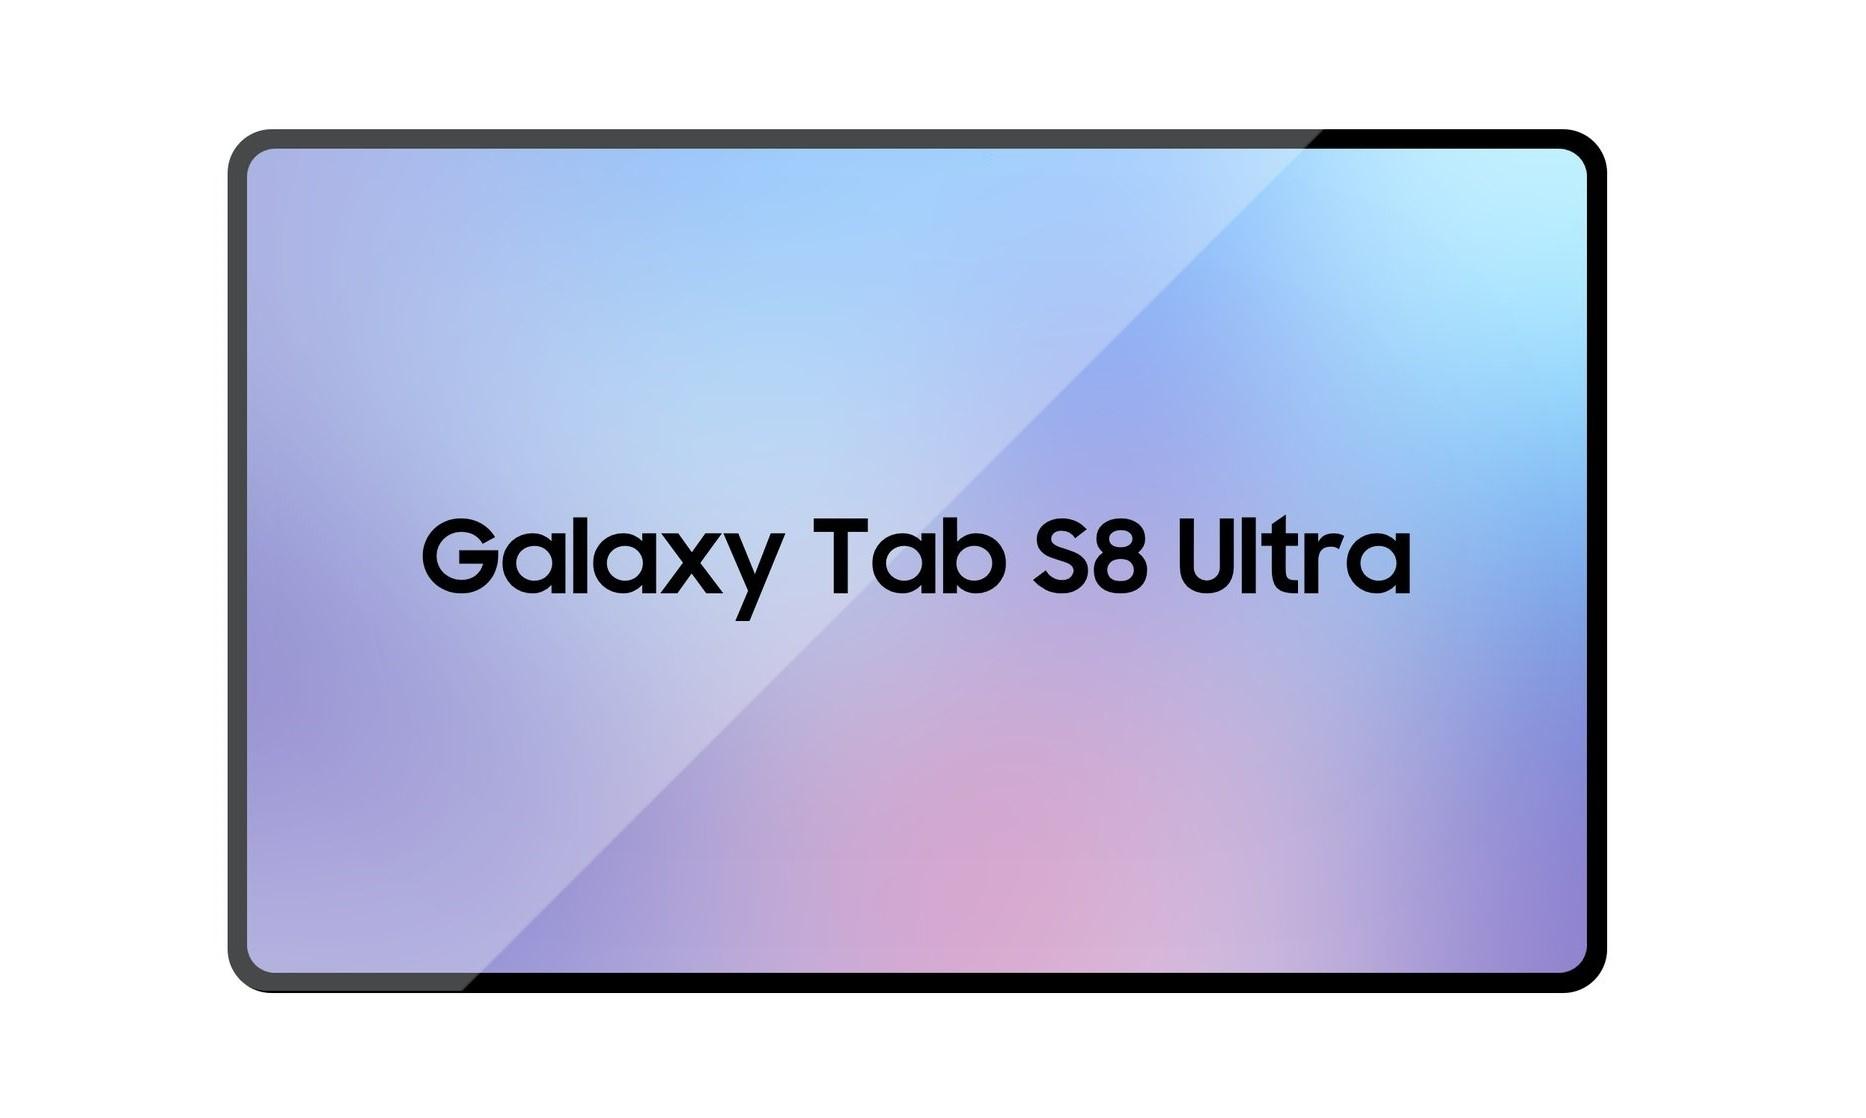 Samsung Galaxy Tab S8 Ultra debutta con la tecnologia BRS